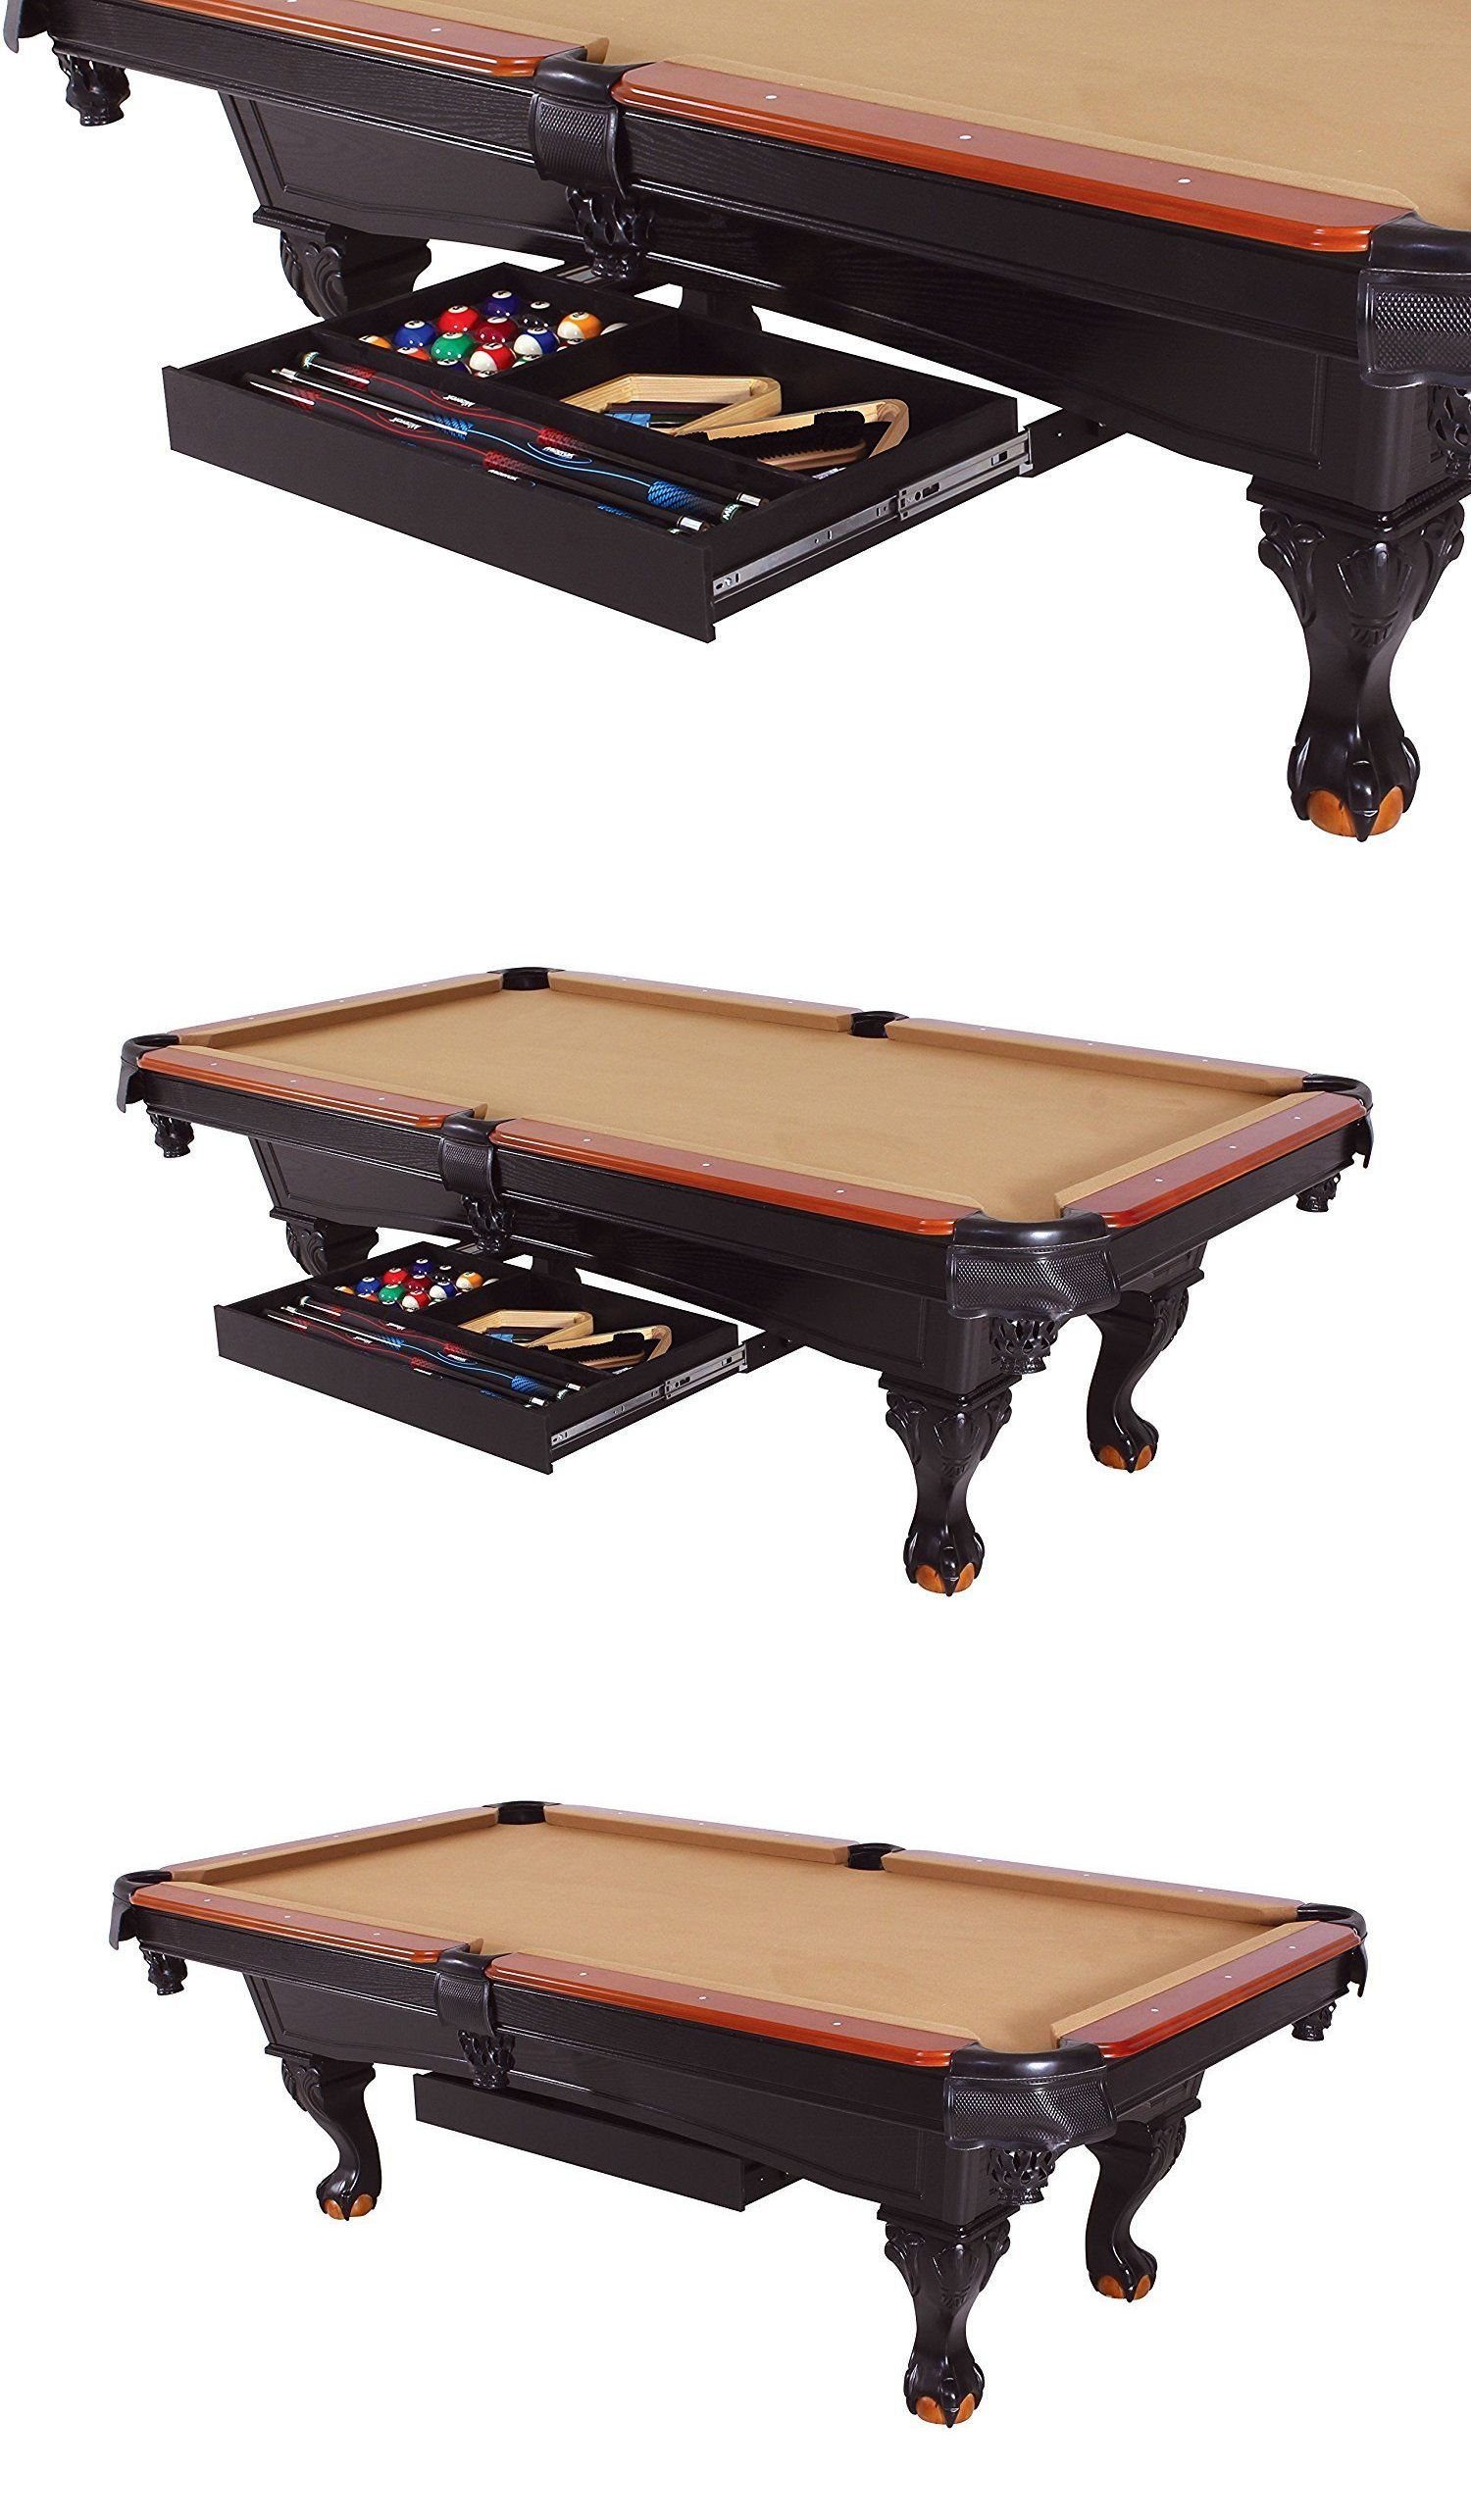 Ball and cue racks 75185 universal pool billiard table